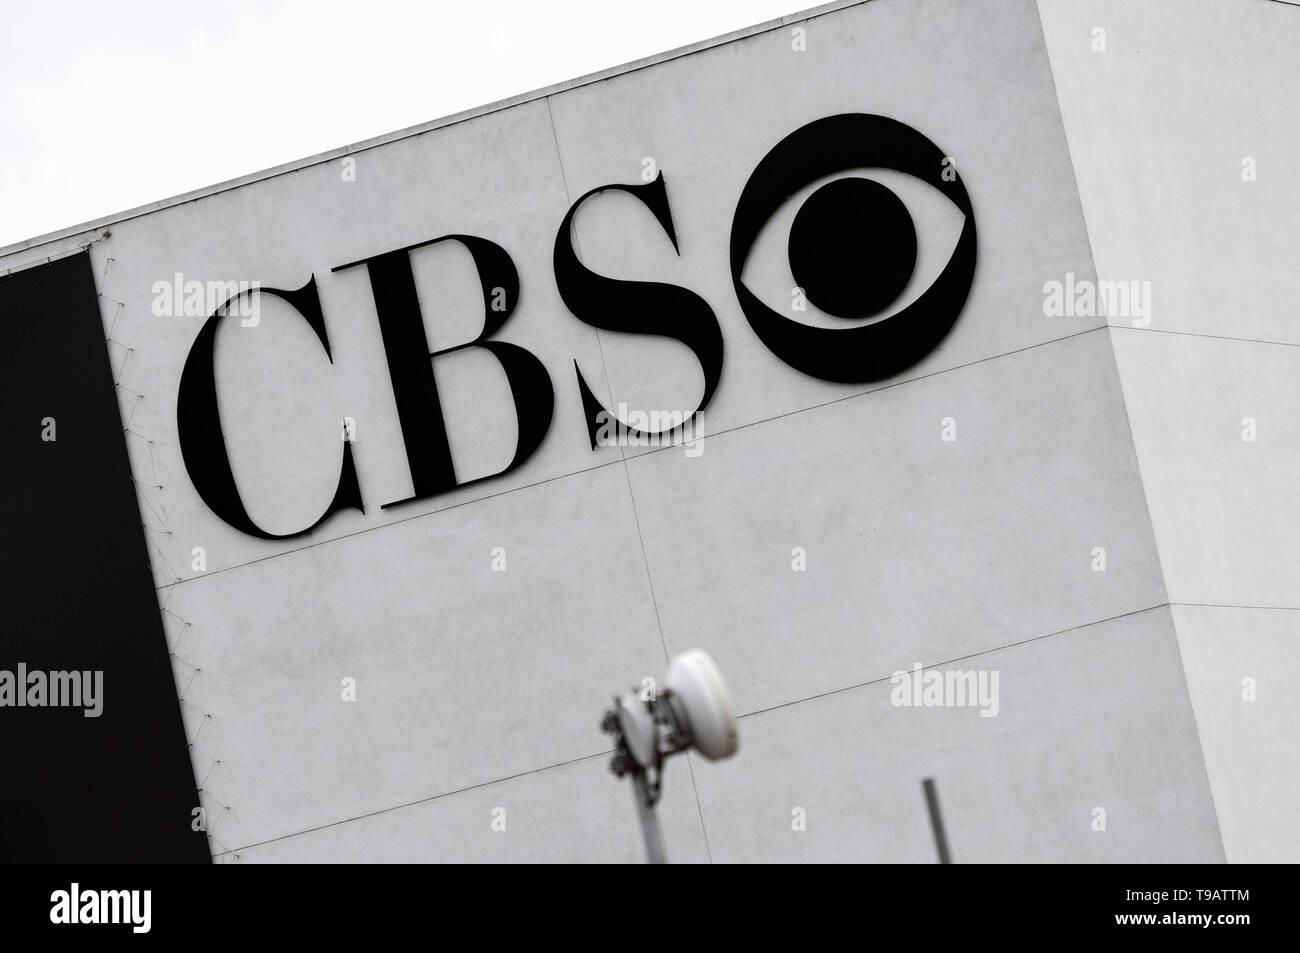 Los Angeles, CA, USA  14th Feb, 2019  CBS logo seen at the